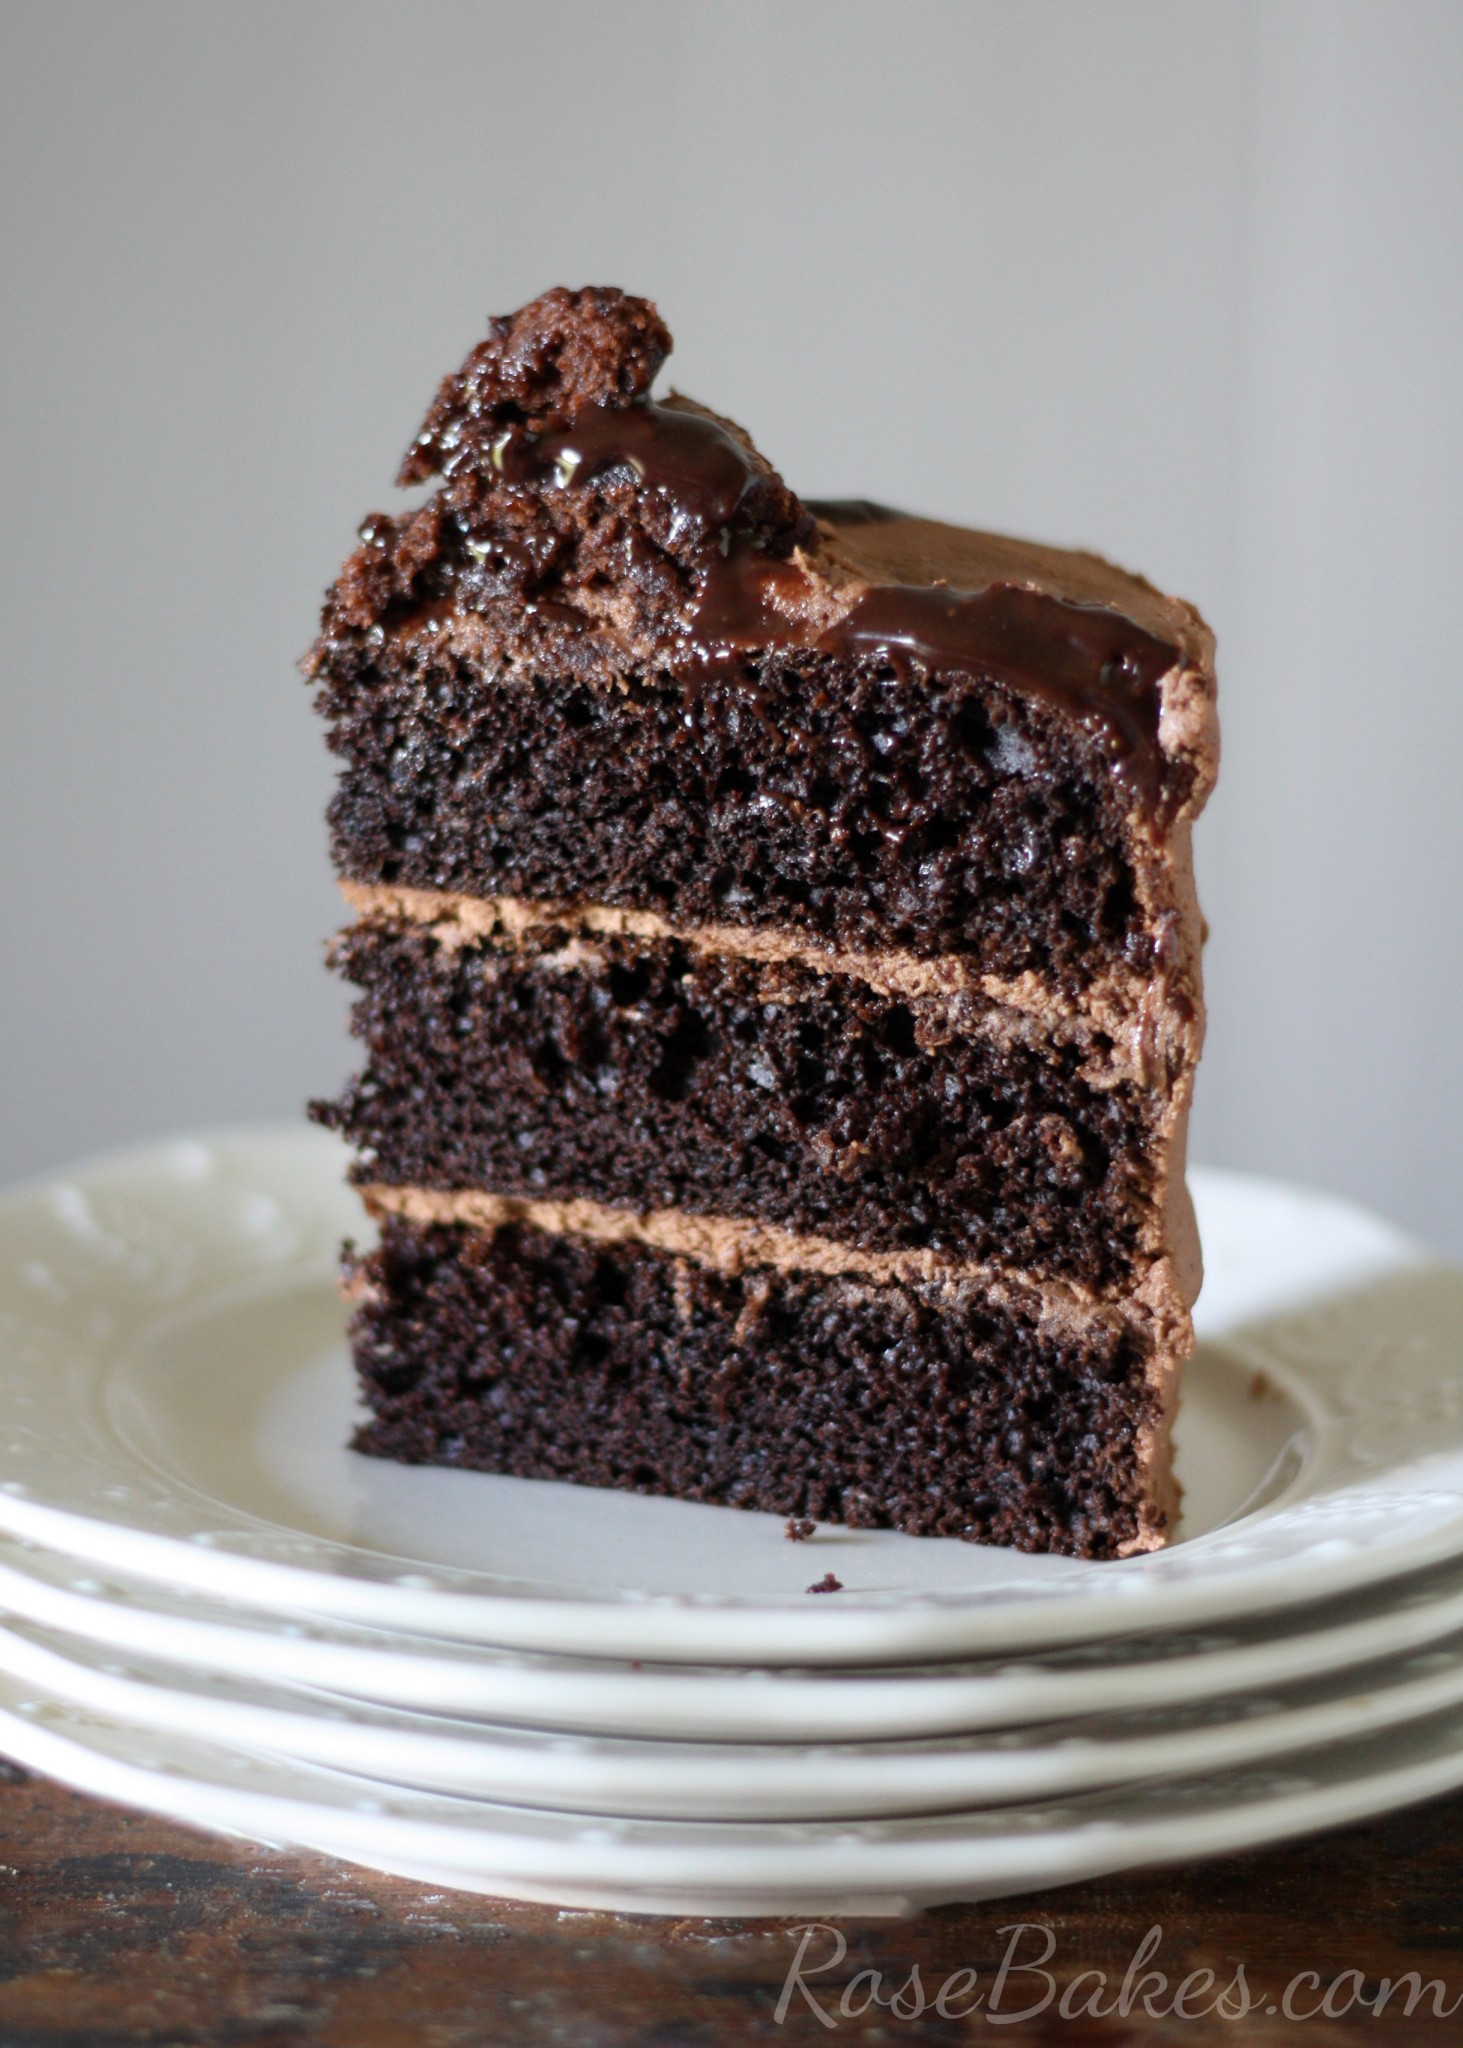 Healthy Chocolate Cake Recipe From Scratch  e Bowl Chocolate Cake from scratch Rose Bakes